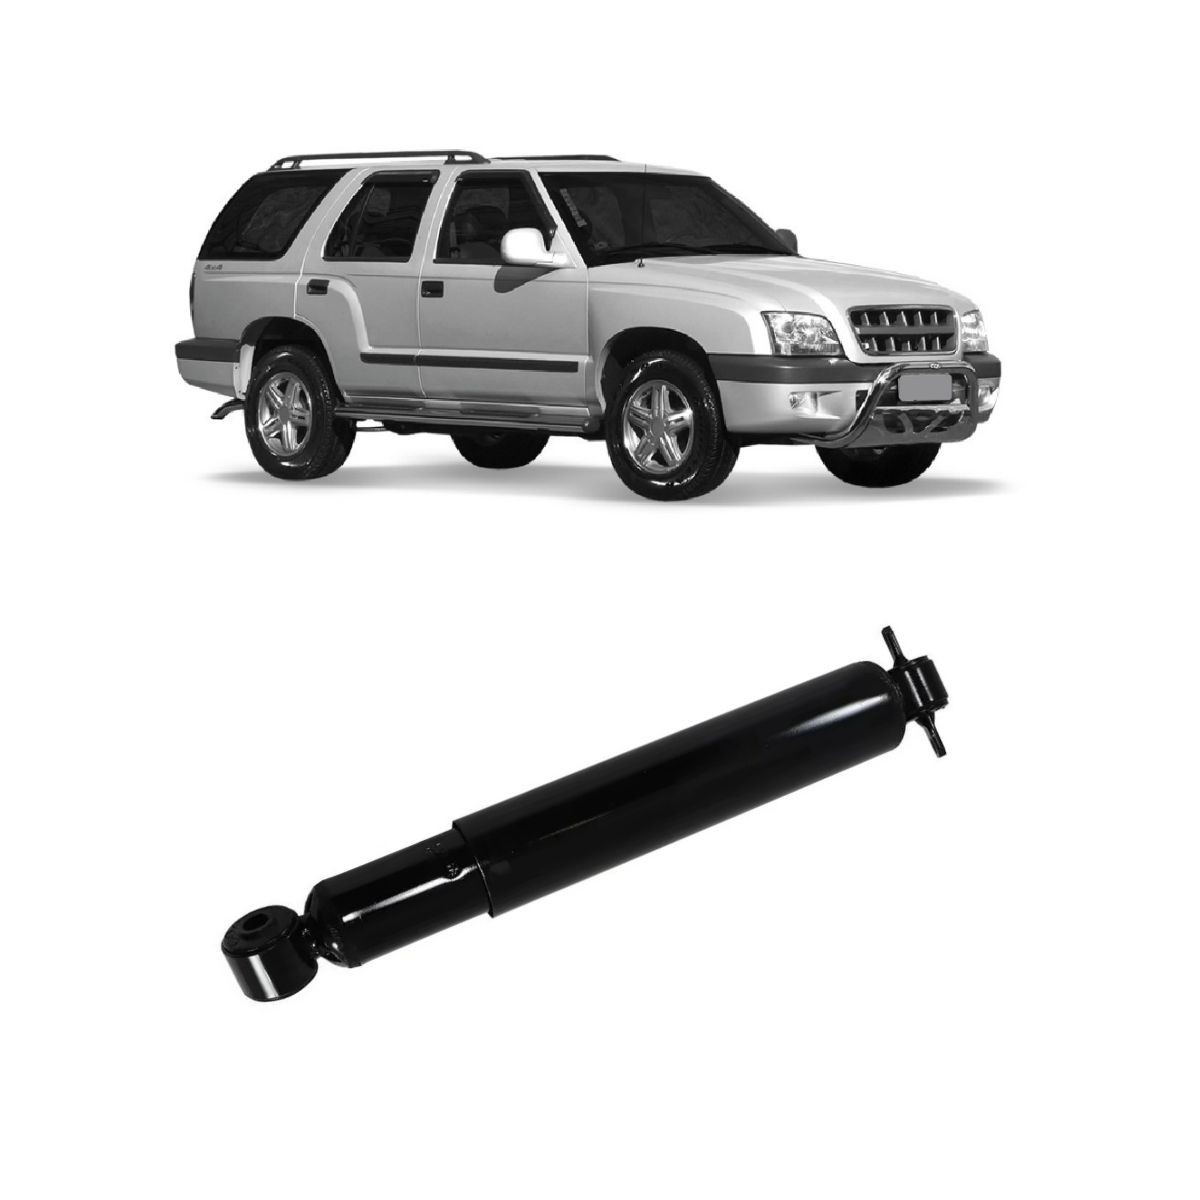 Amortecedor Traseiro Óleo Chevrolet Blazer 1995/1999